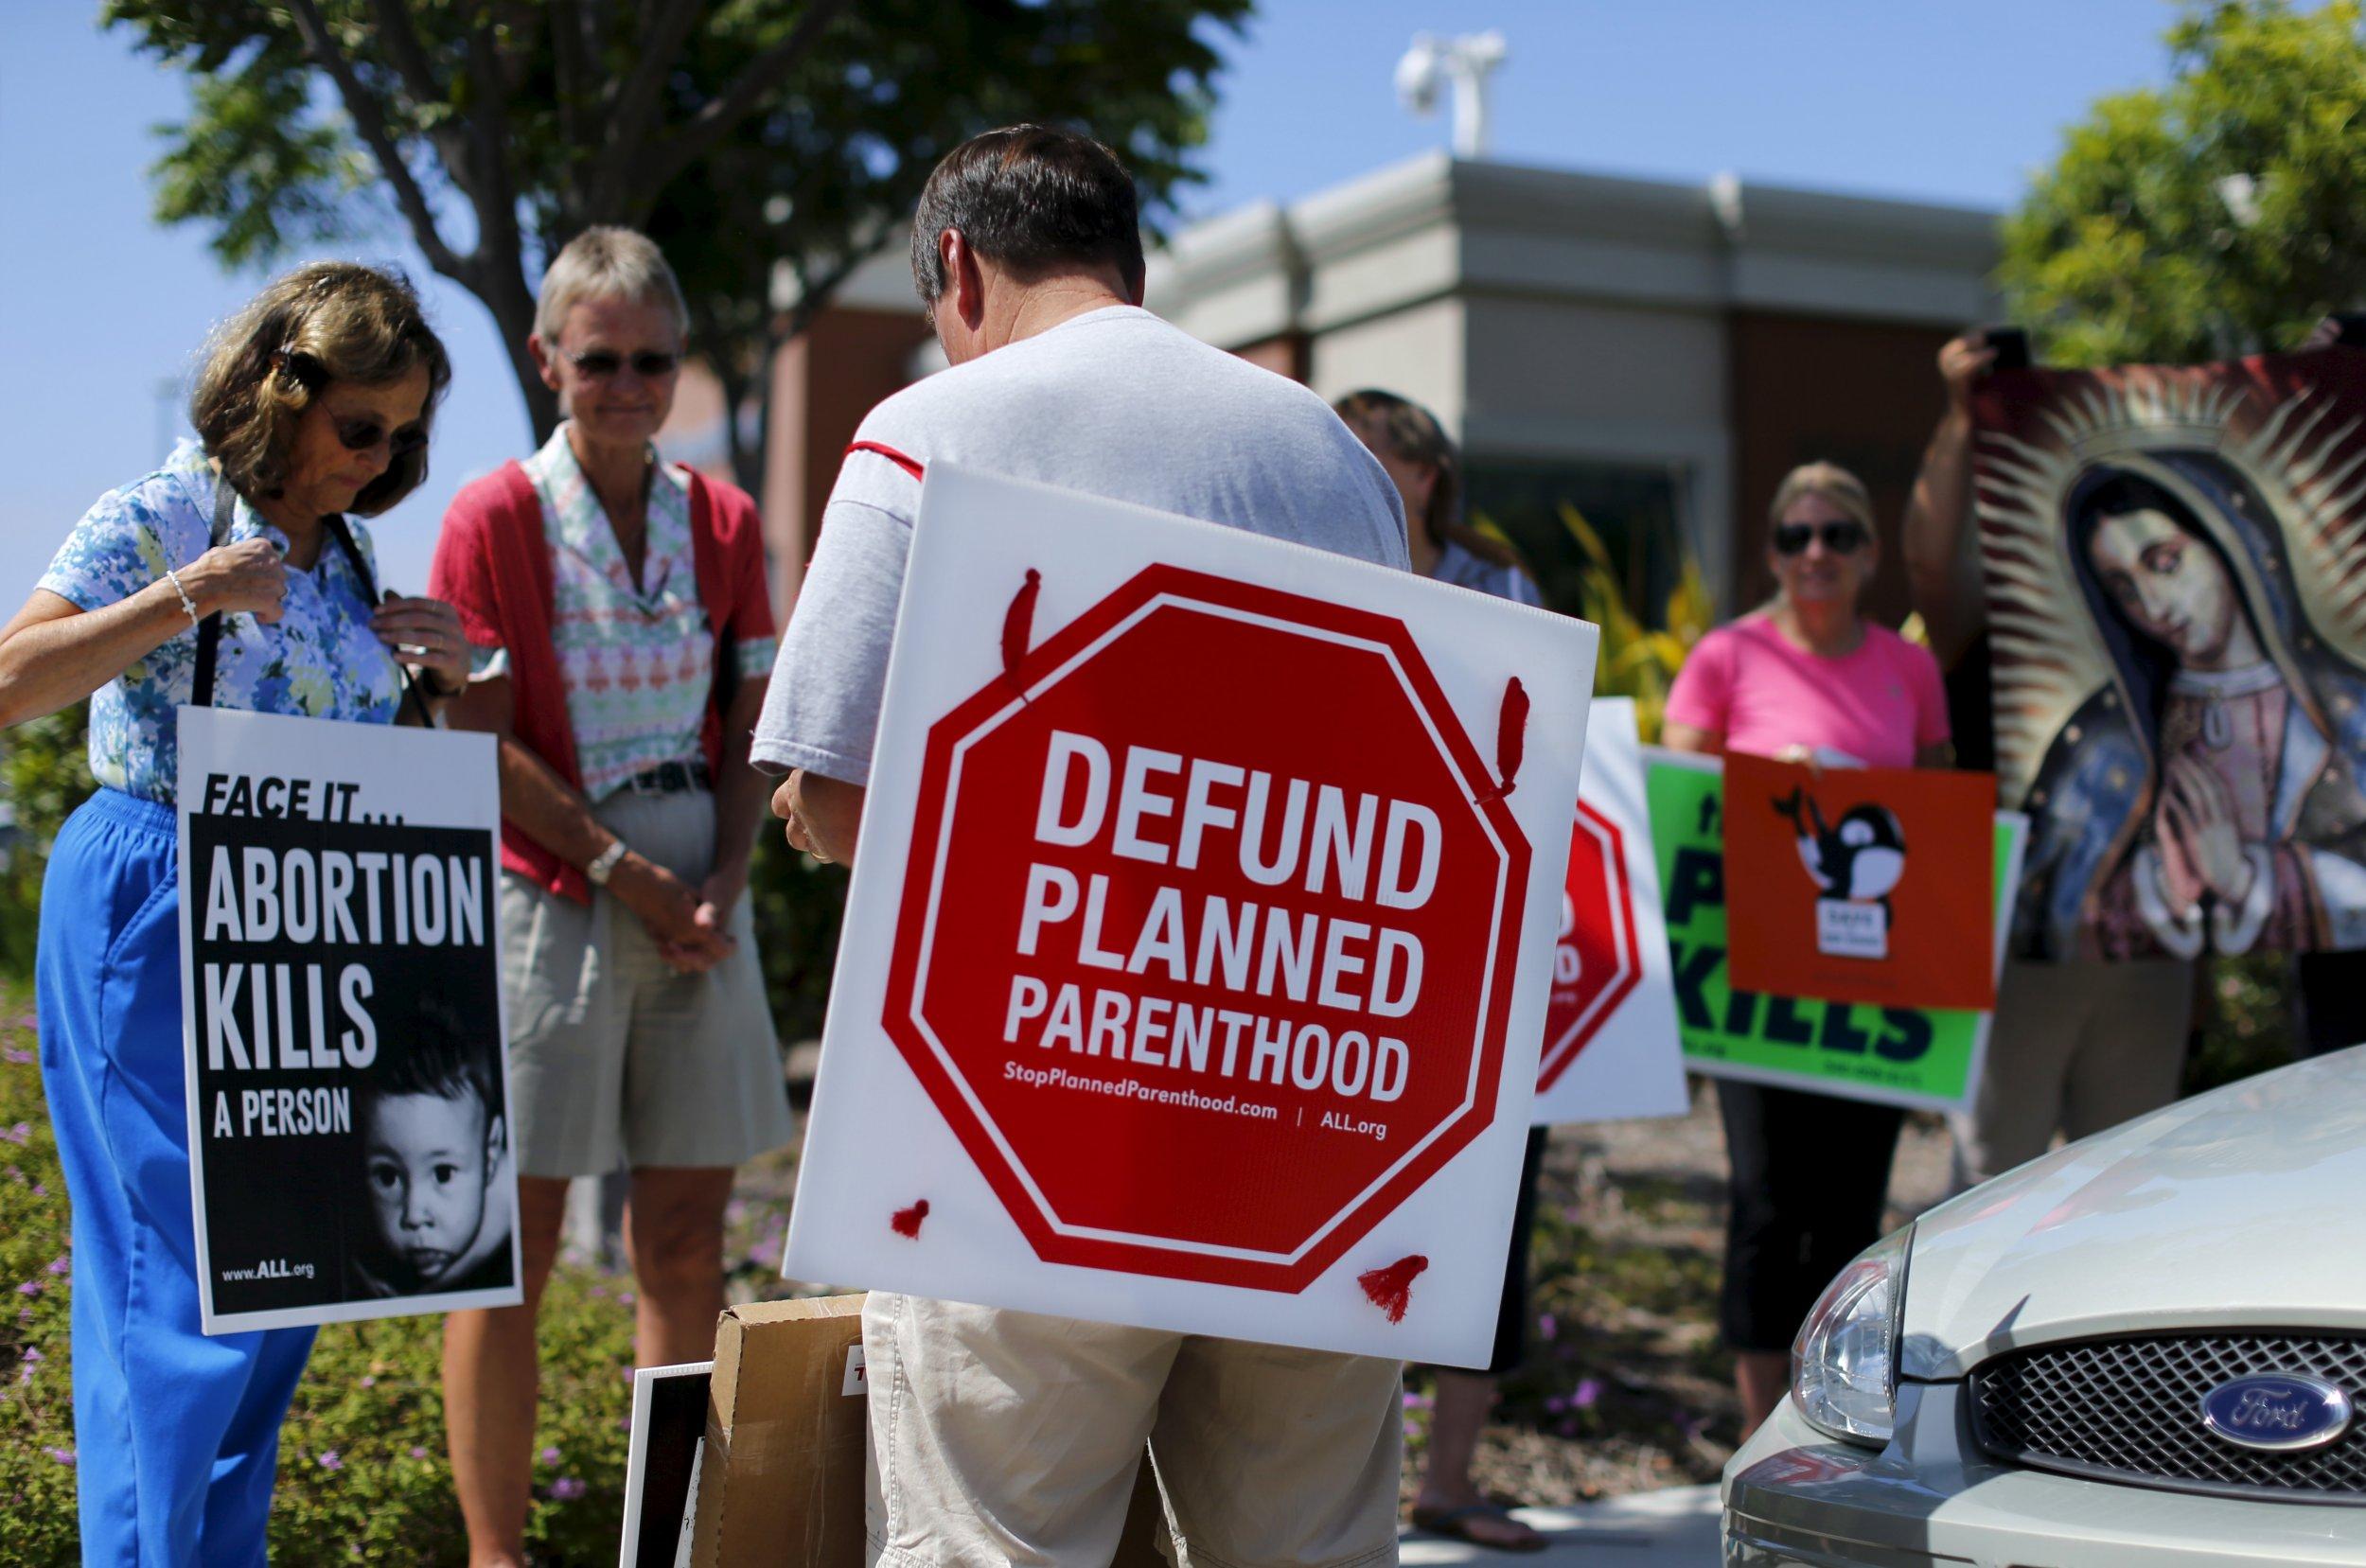 Planned_Parenthood_Idaho